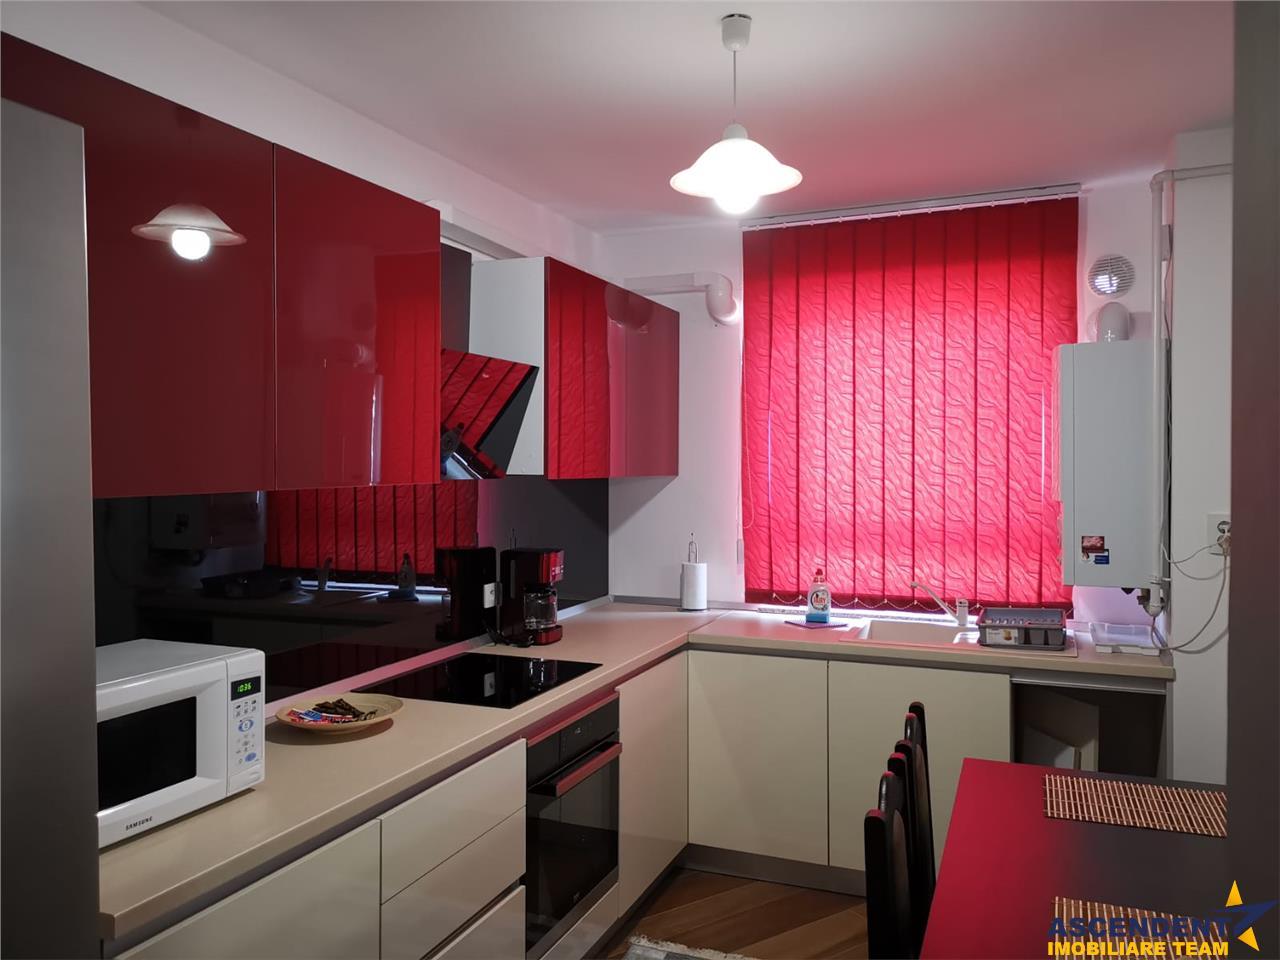 OFERTA REZERVATA!!Apartament vedere panoramica, pozitie privilegiata, Avantgarden, Brasov